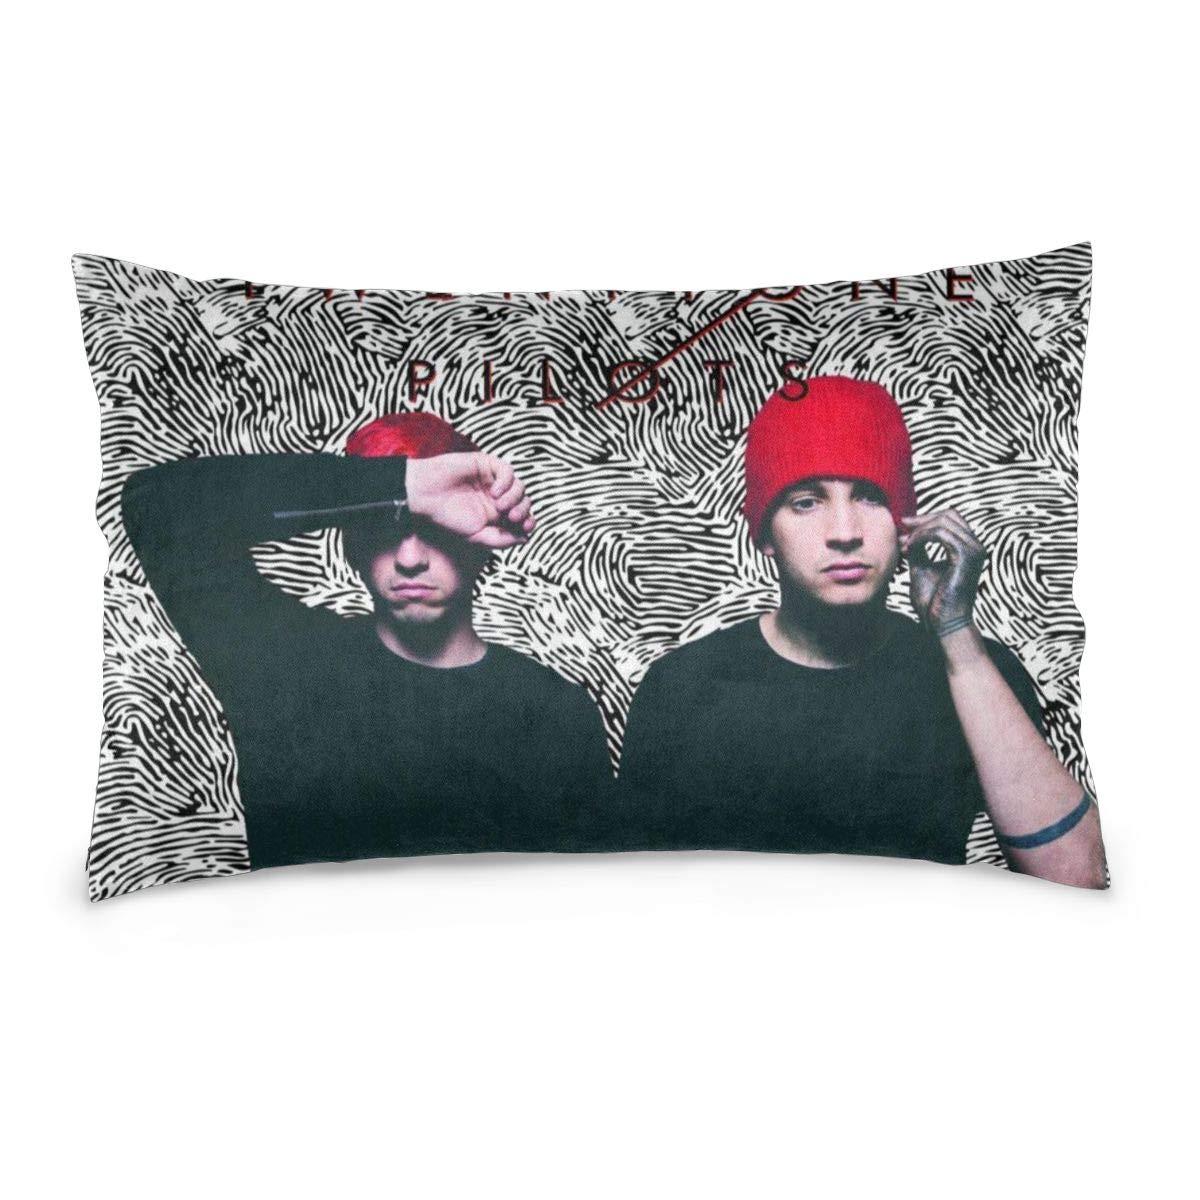 Menhfb Pillowcase Twenty One Singer Pilots Pillow Throw Cushion Cover Home Sofa Bed Decoration